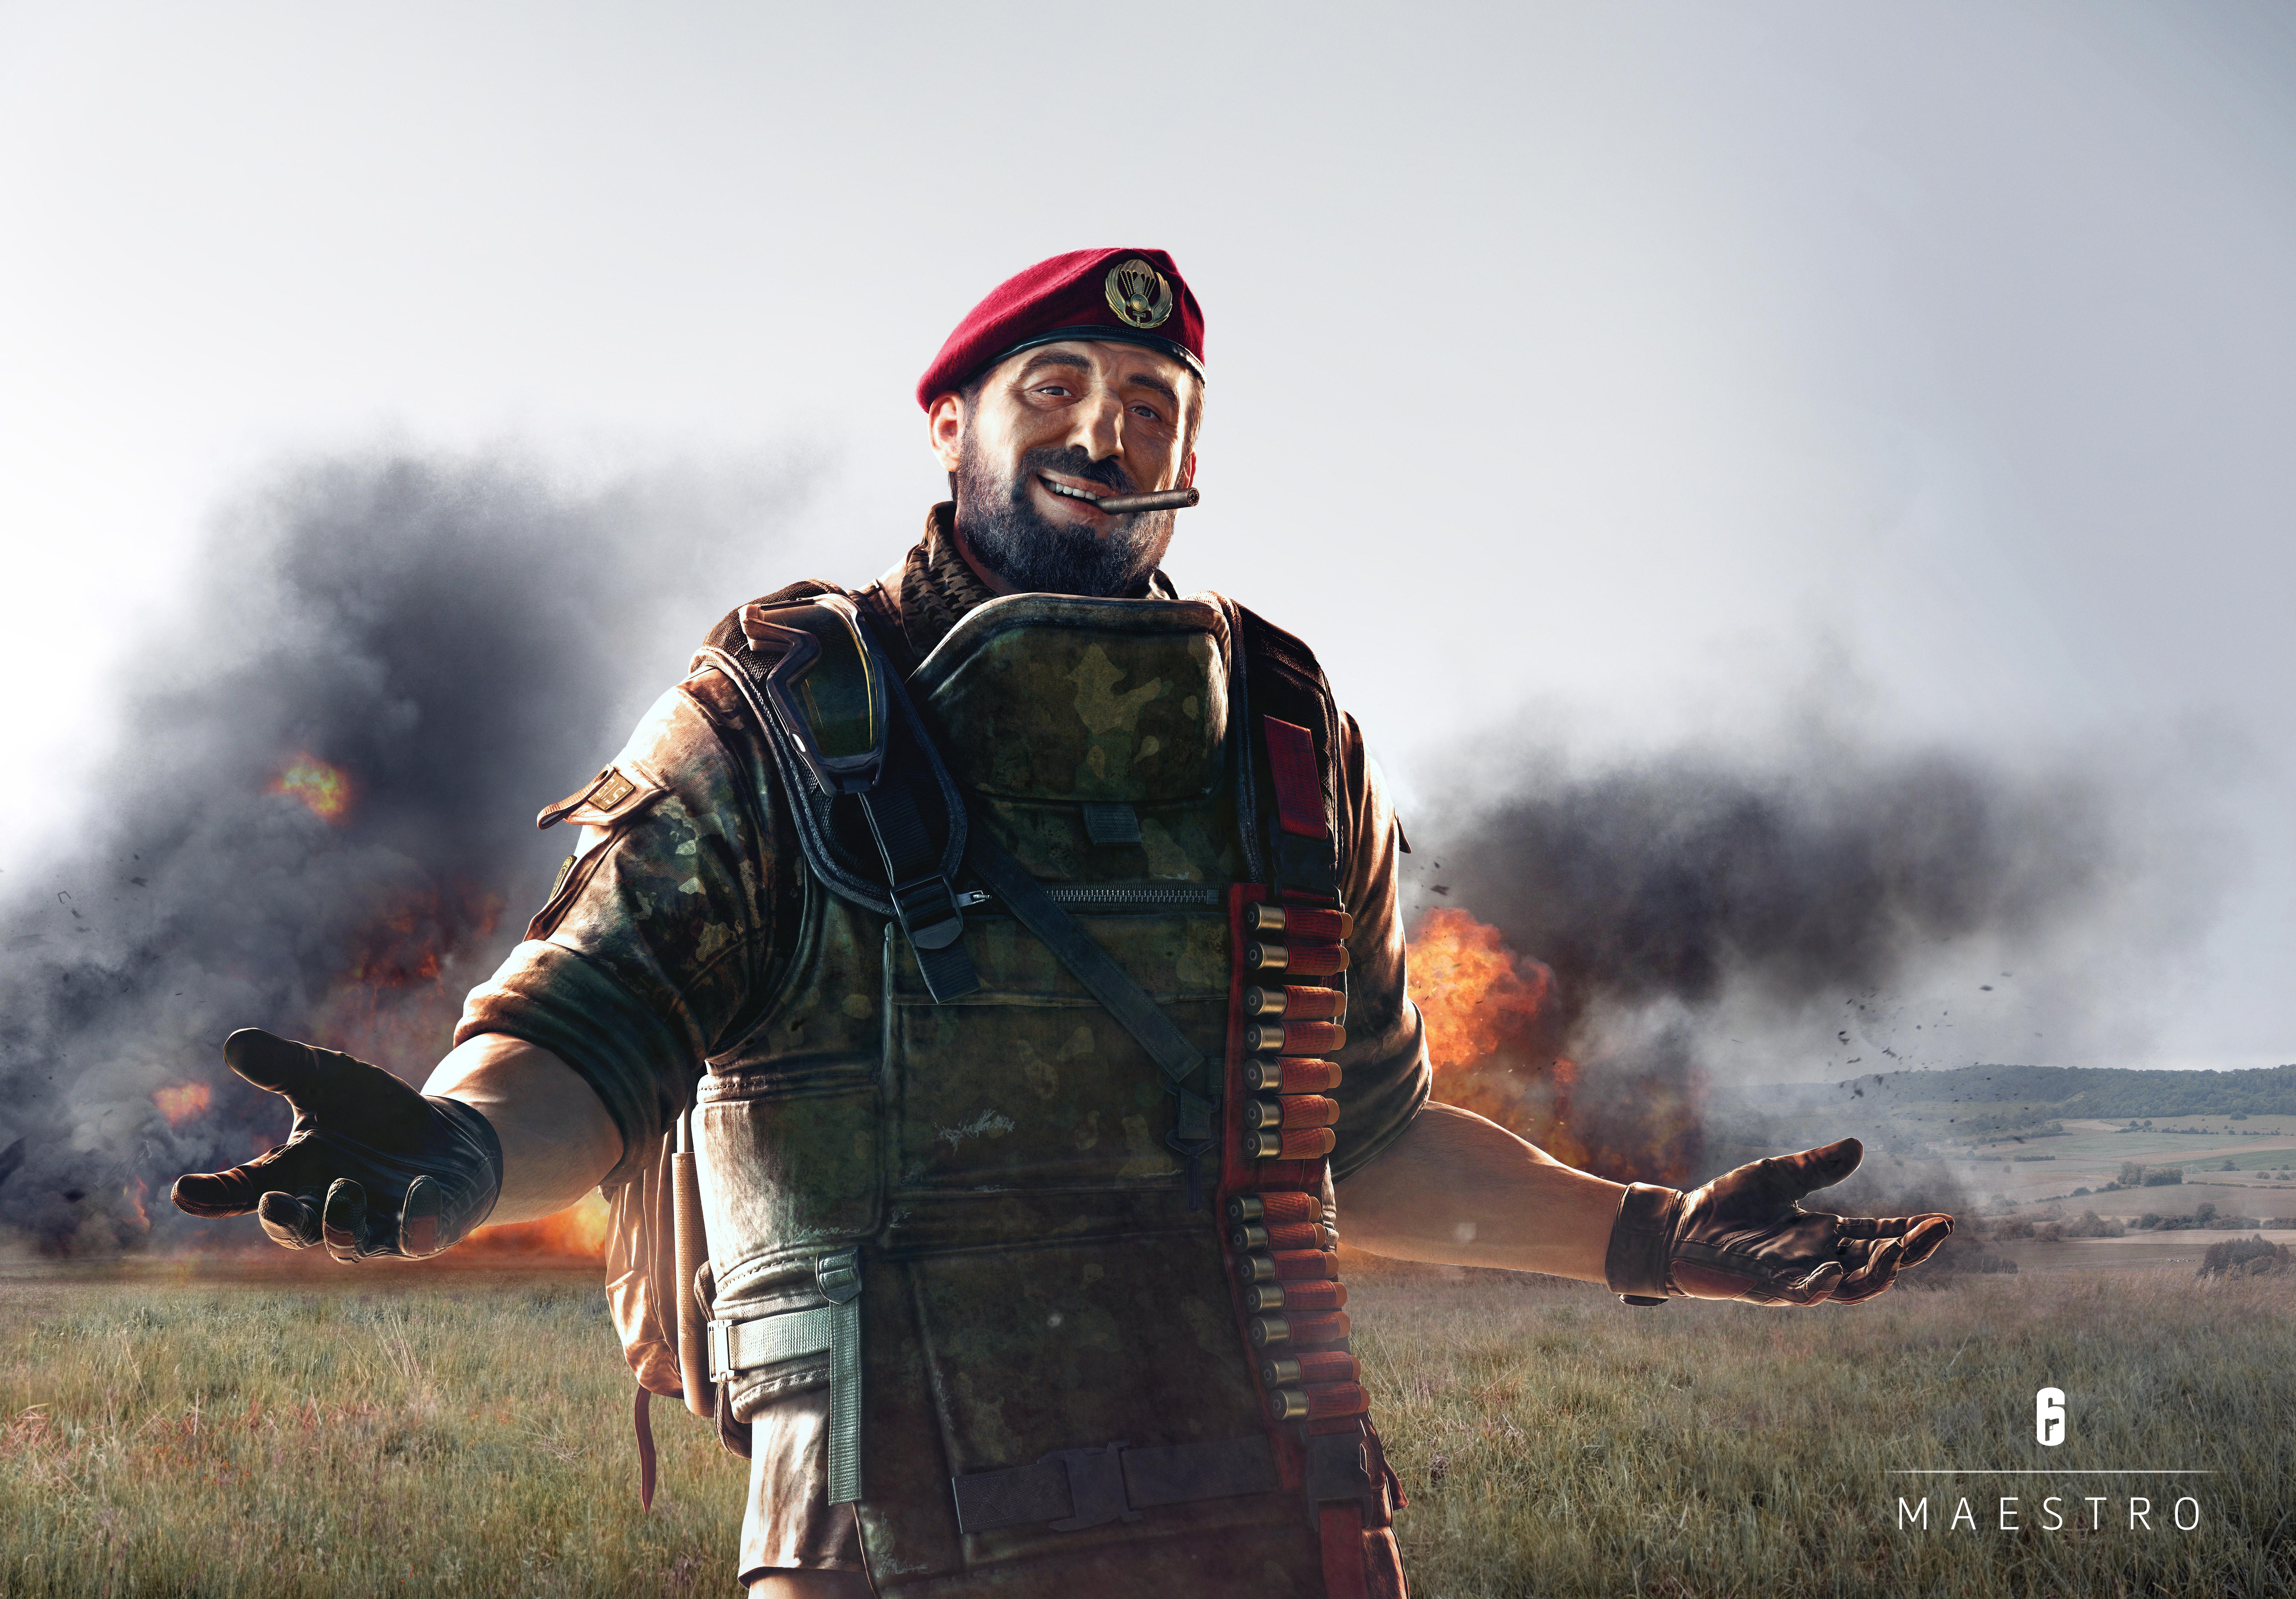 Maestro Tom Clancys Rainbow Six Siege 8k, HD Games, 4k